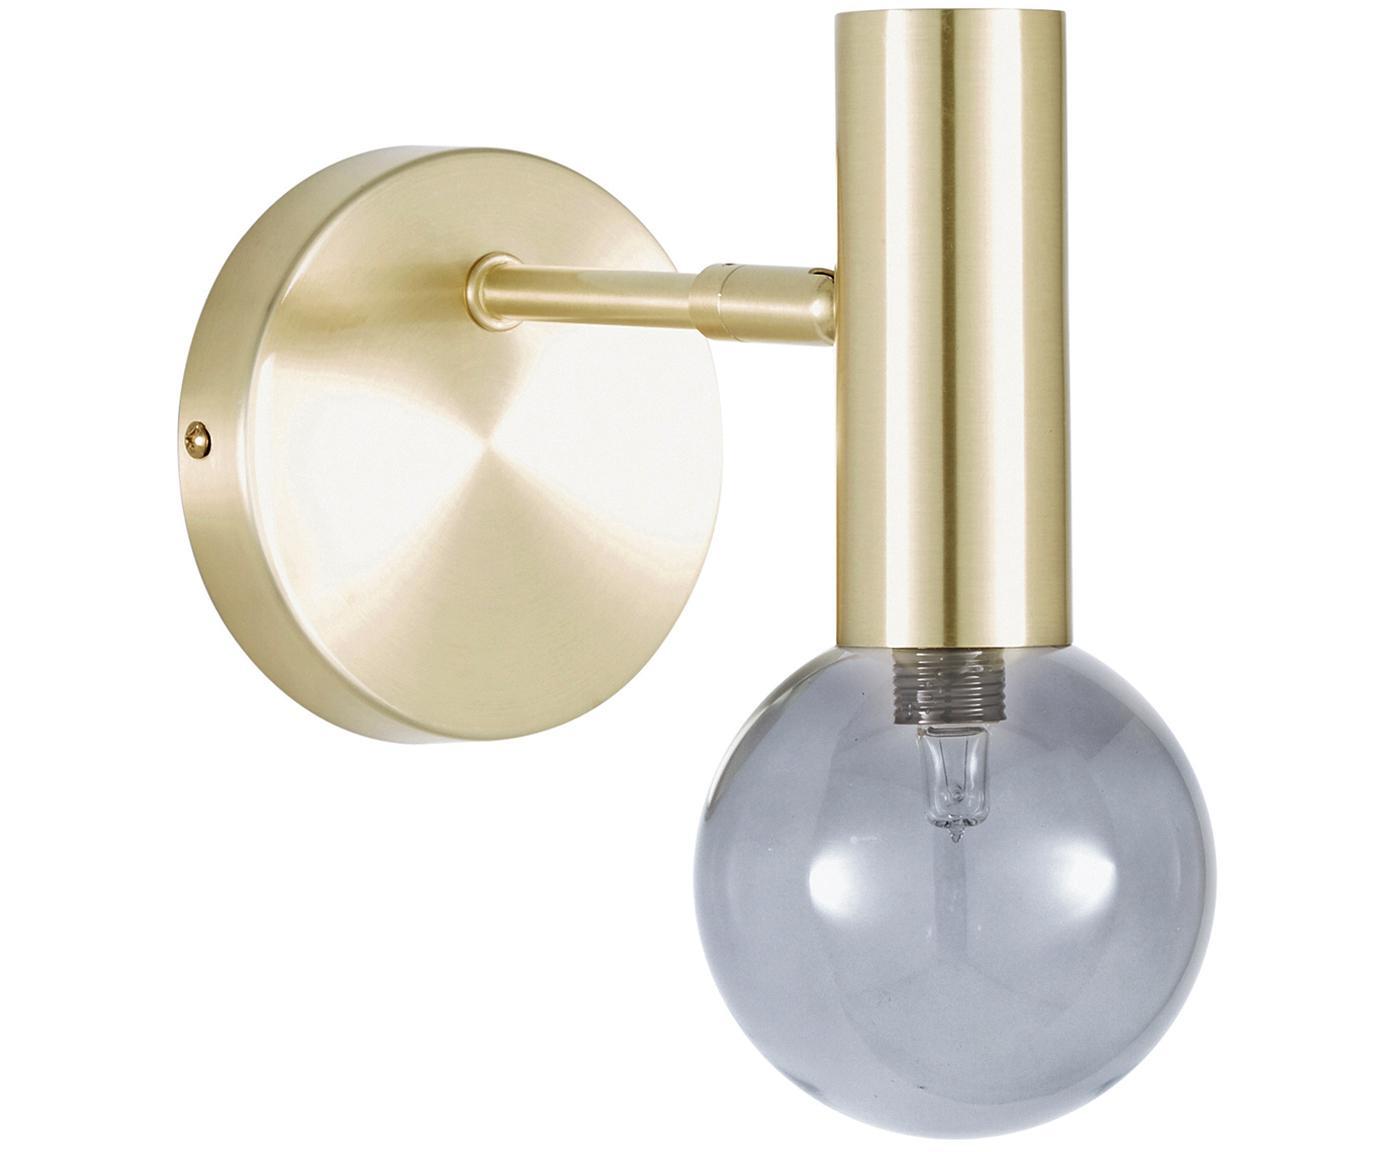 Wandlamp Wilson, Frame: vermessingd metaal, Fitting: vermessingd metaal, Lampenkap: glas, Messingkleurig, Ø 10 x H 22 cm